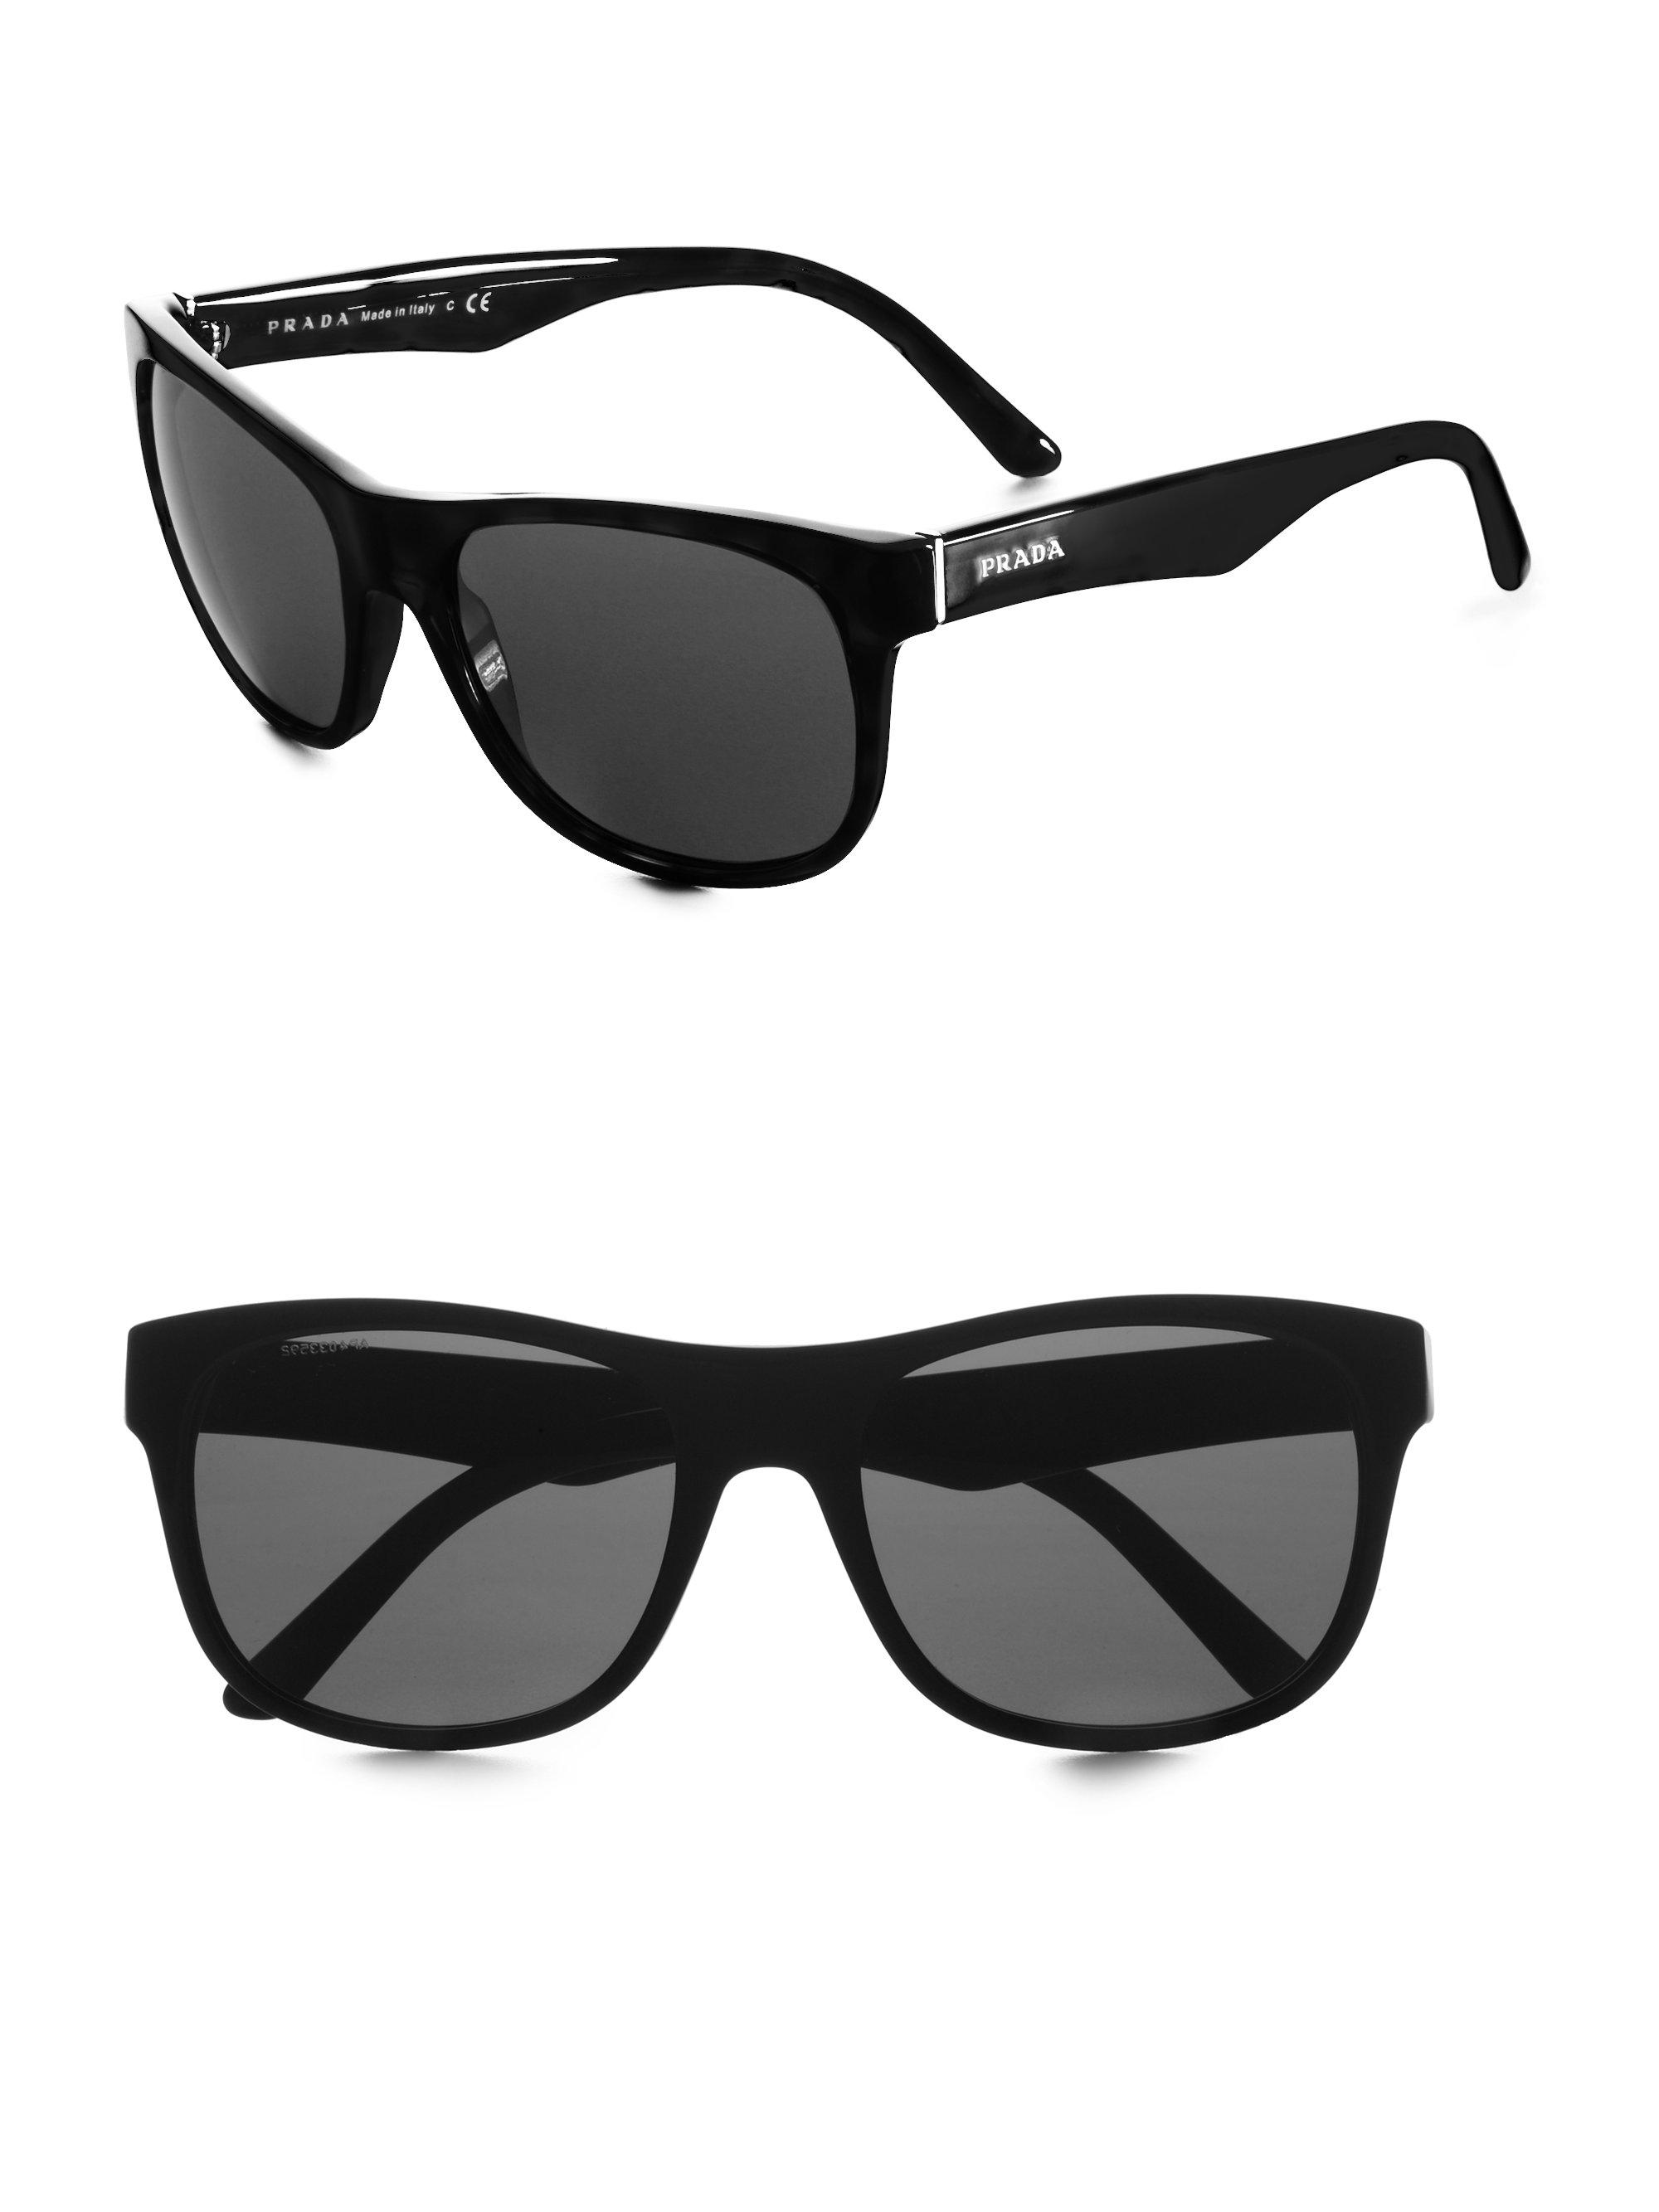 lyst prada wayfarer sunglasses in black for